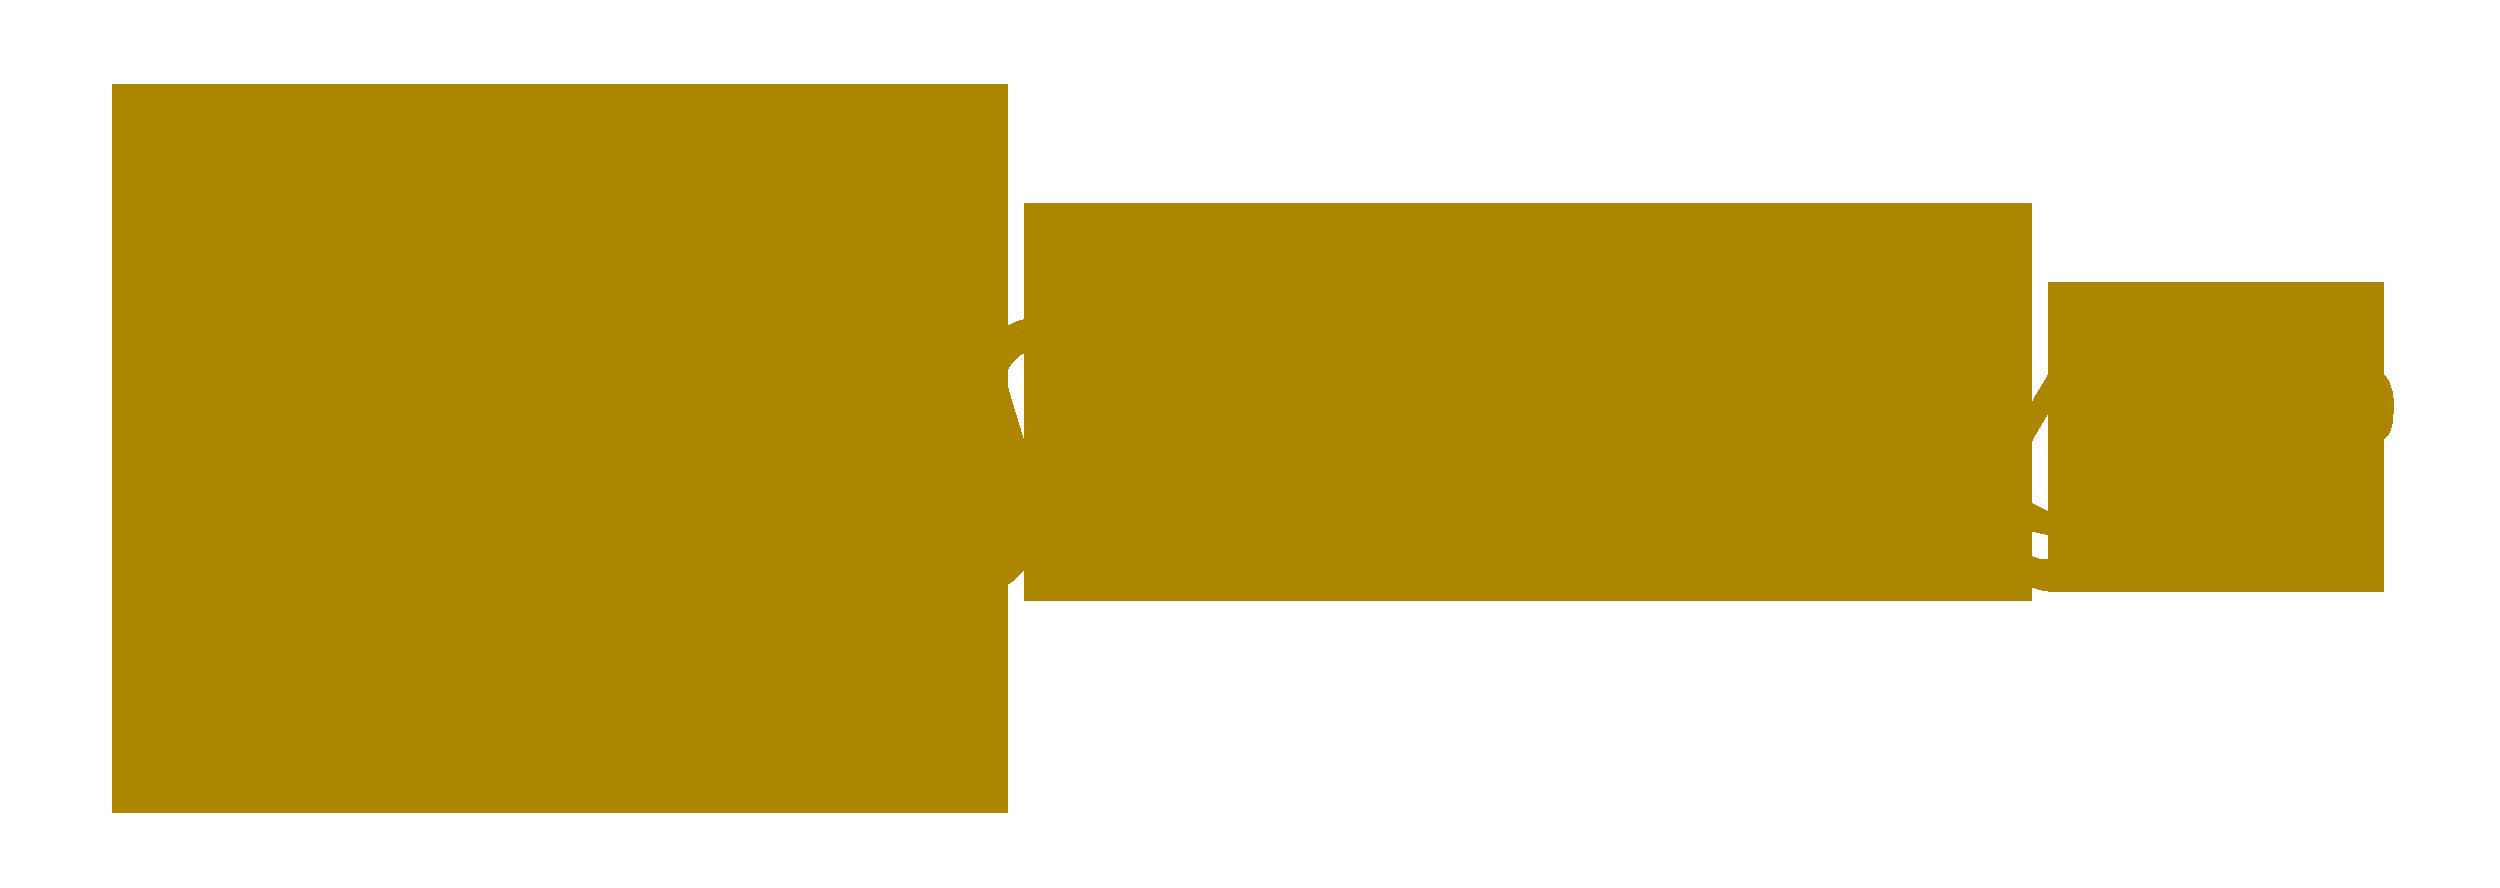 Gustariso - In riso veritas